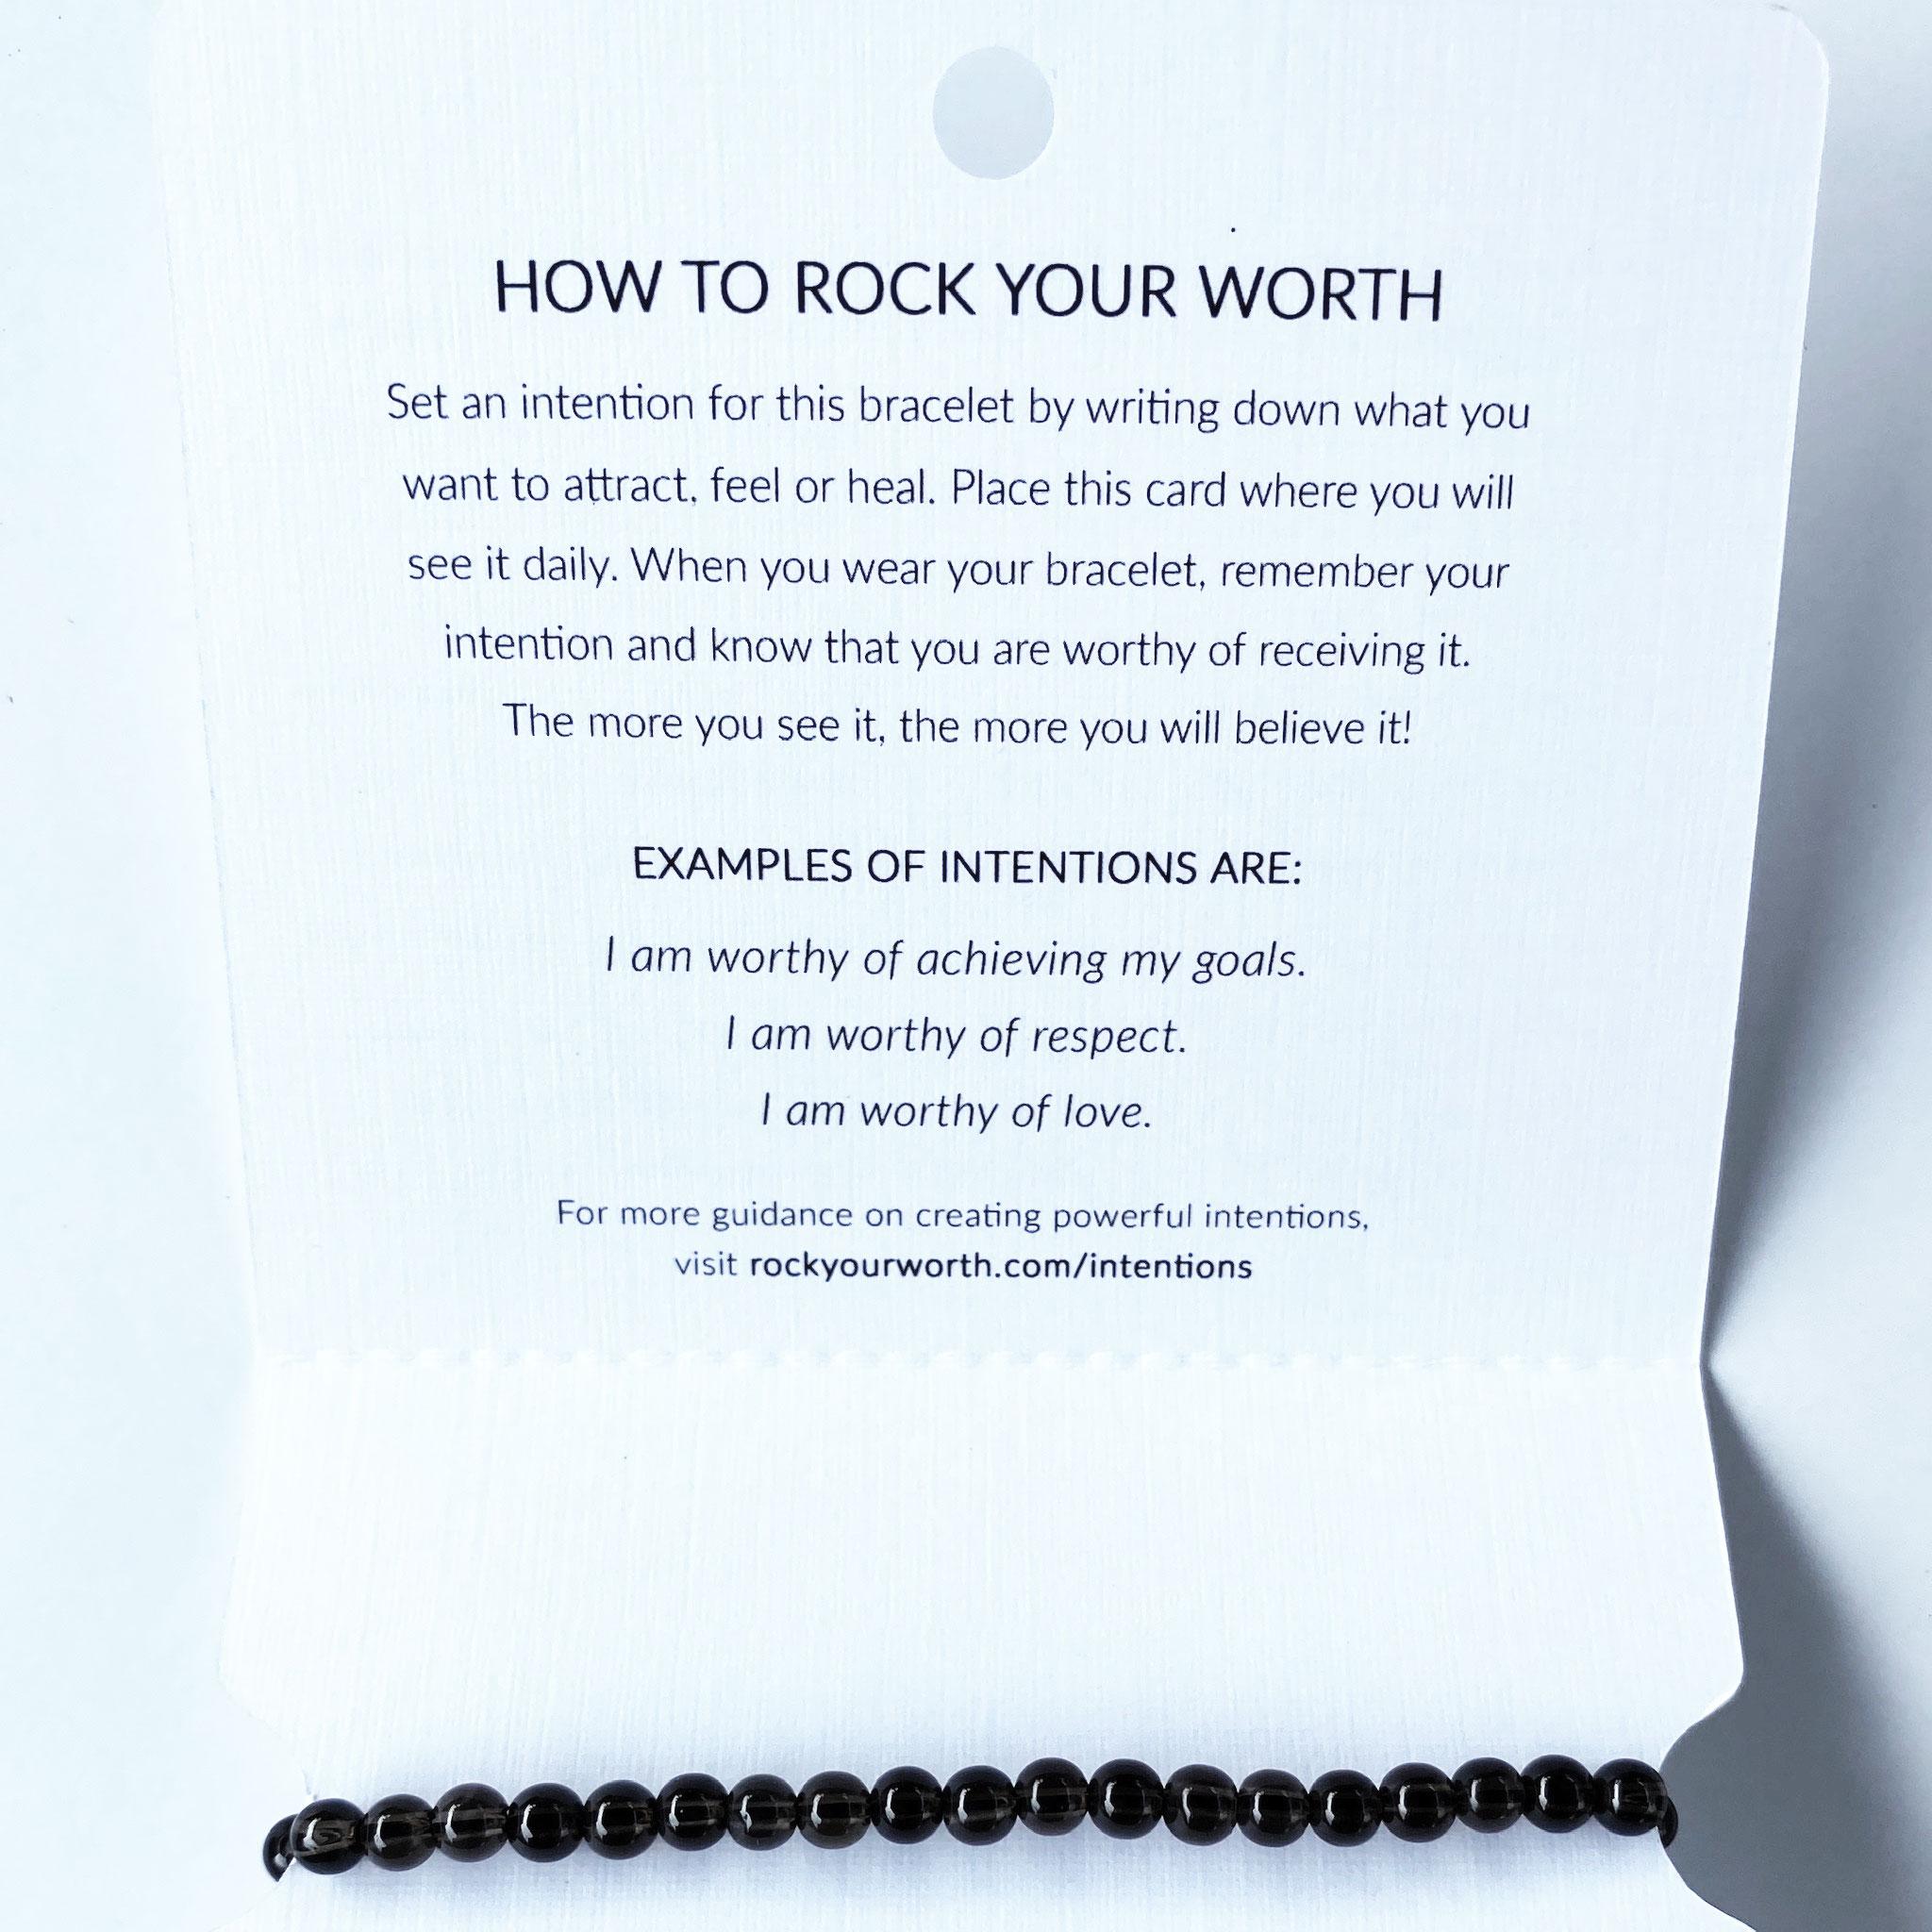 Smoky Quartz Bracelet Rock Your Worth